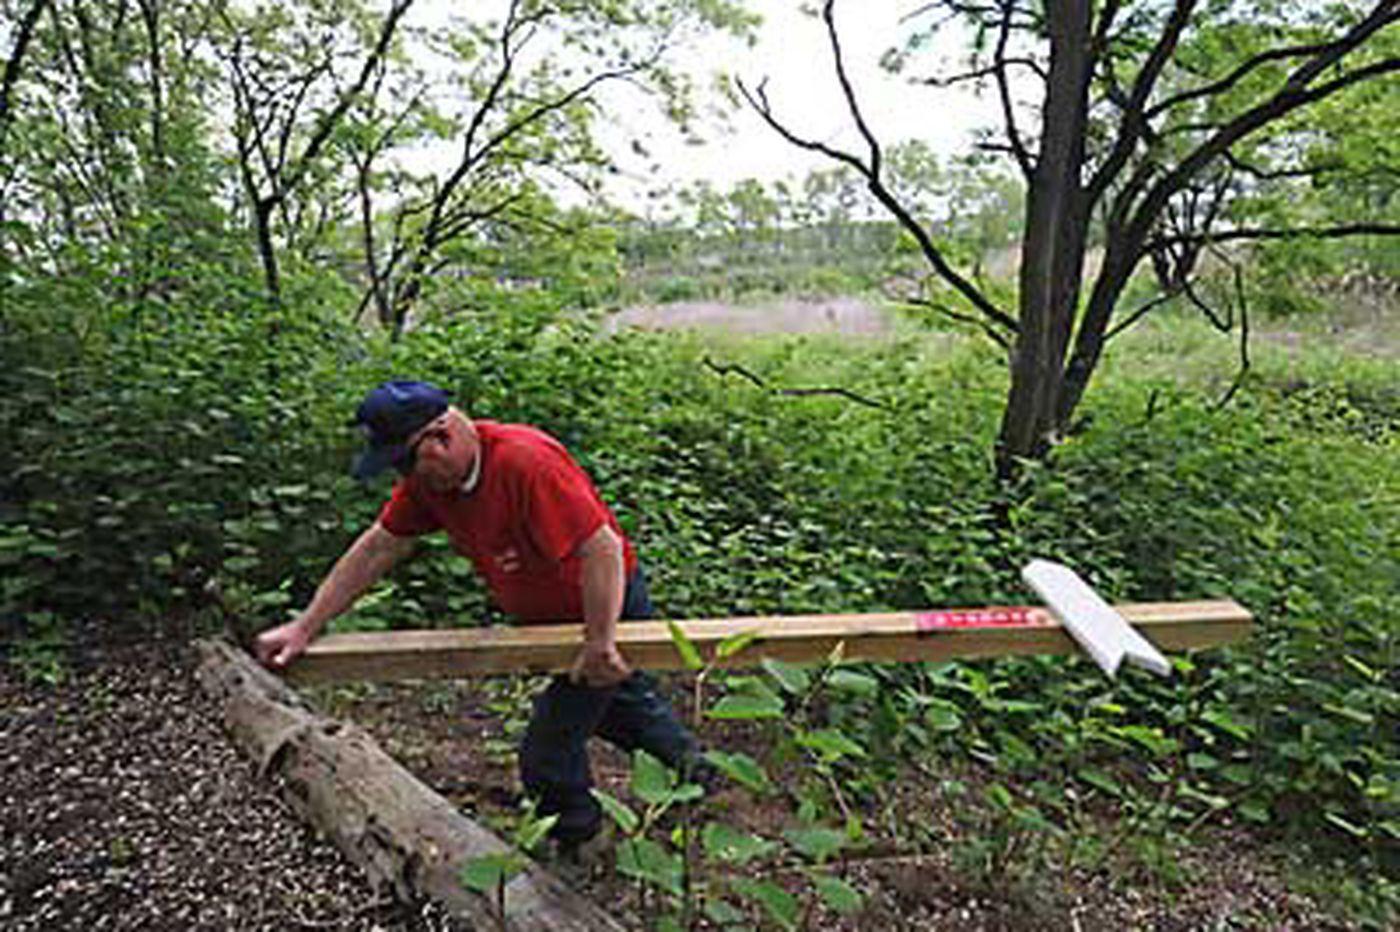 Delanco fights for river trails